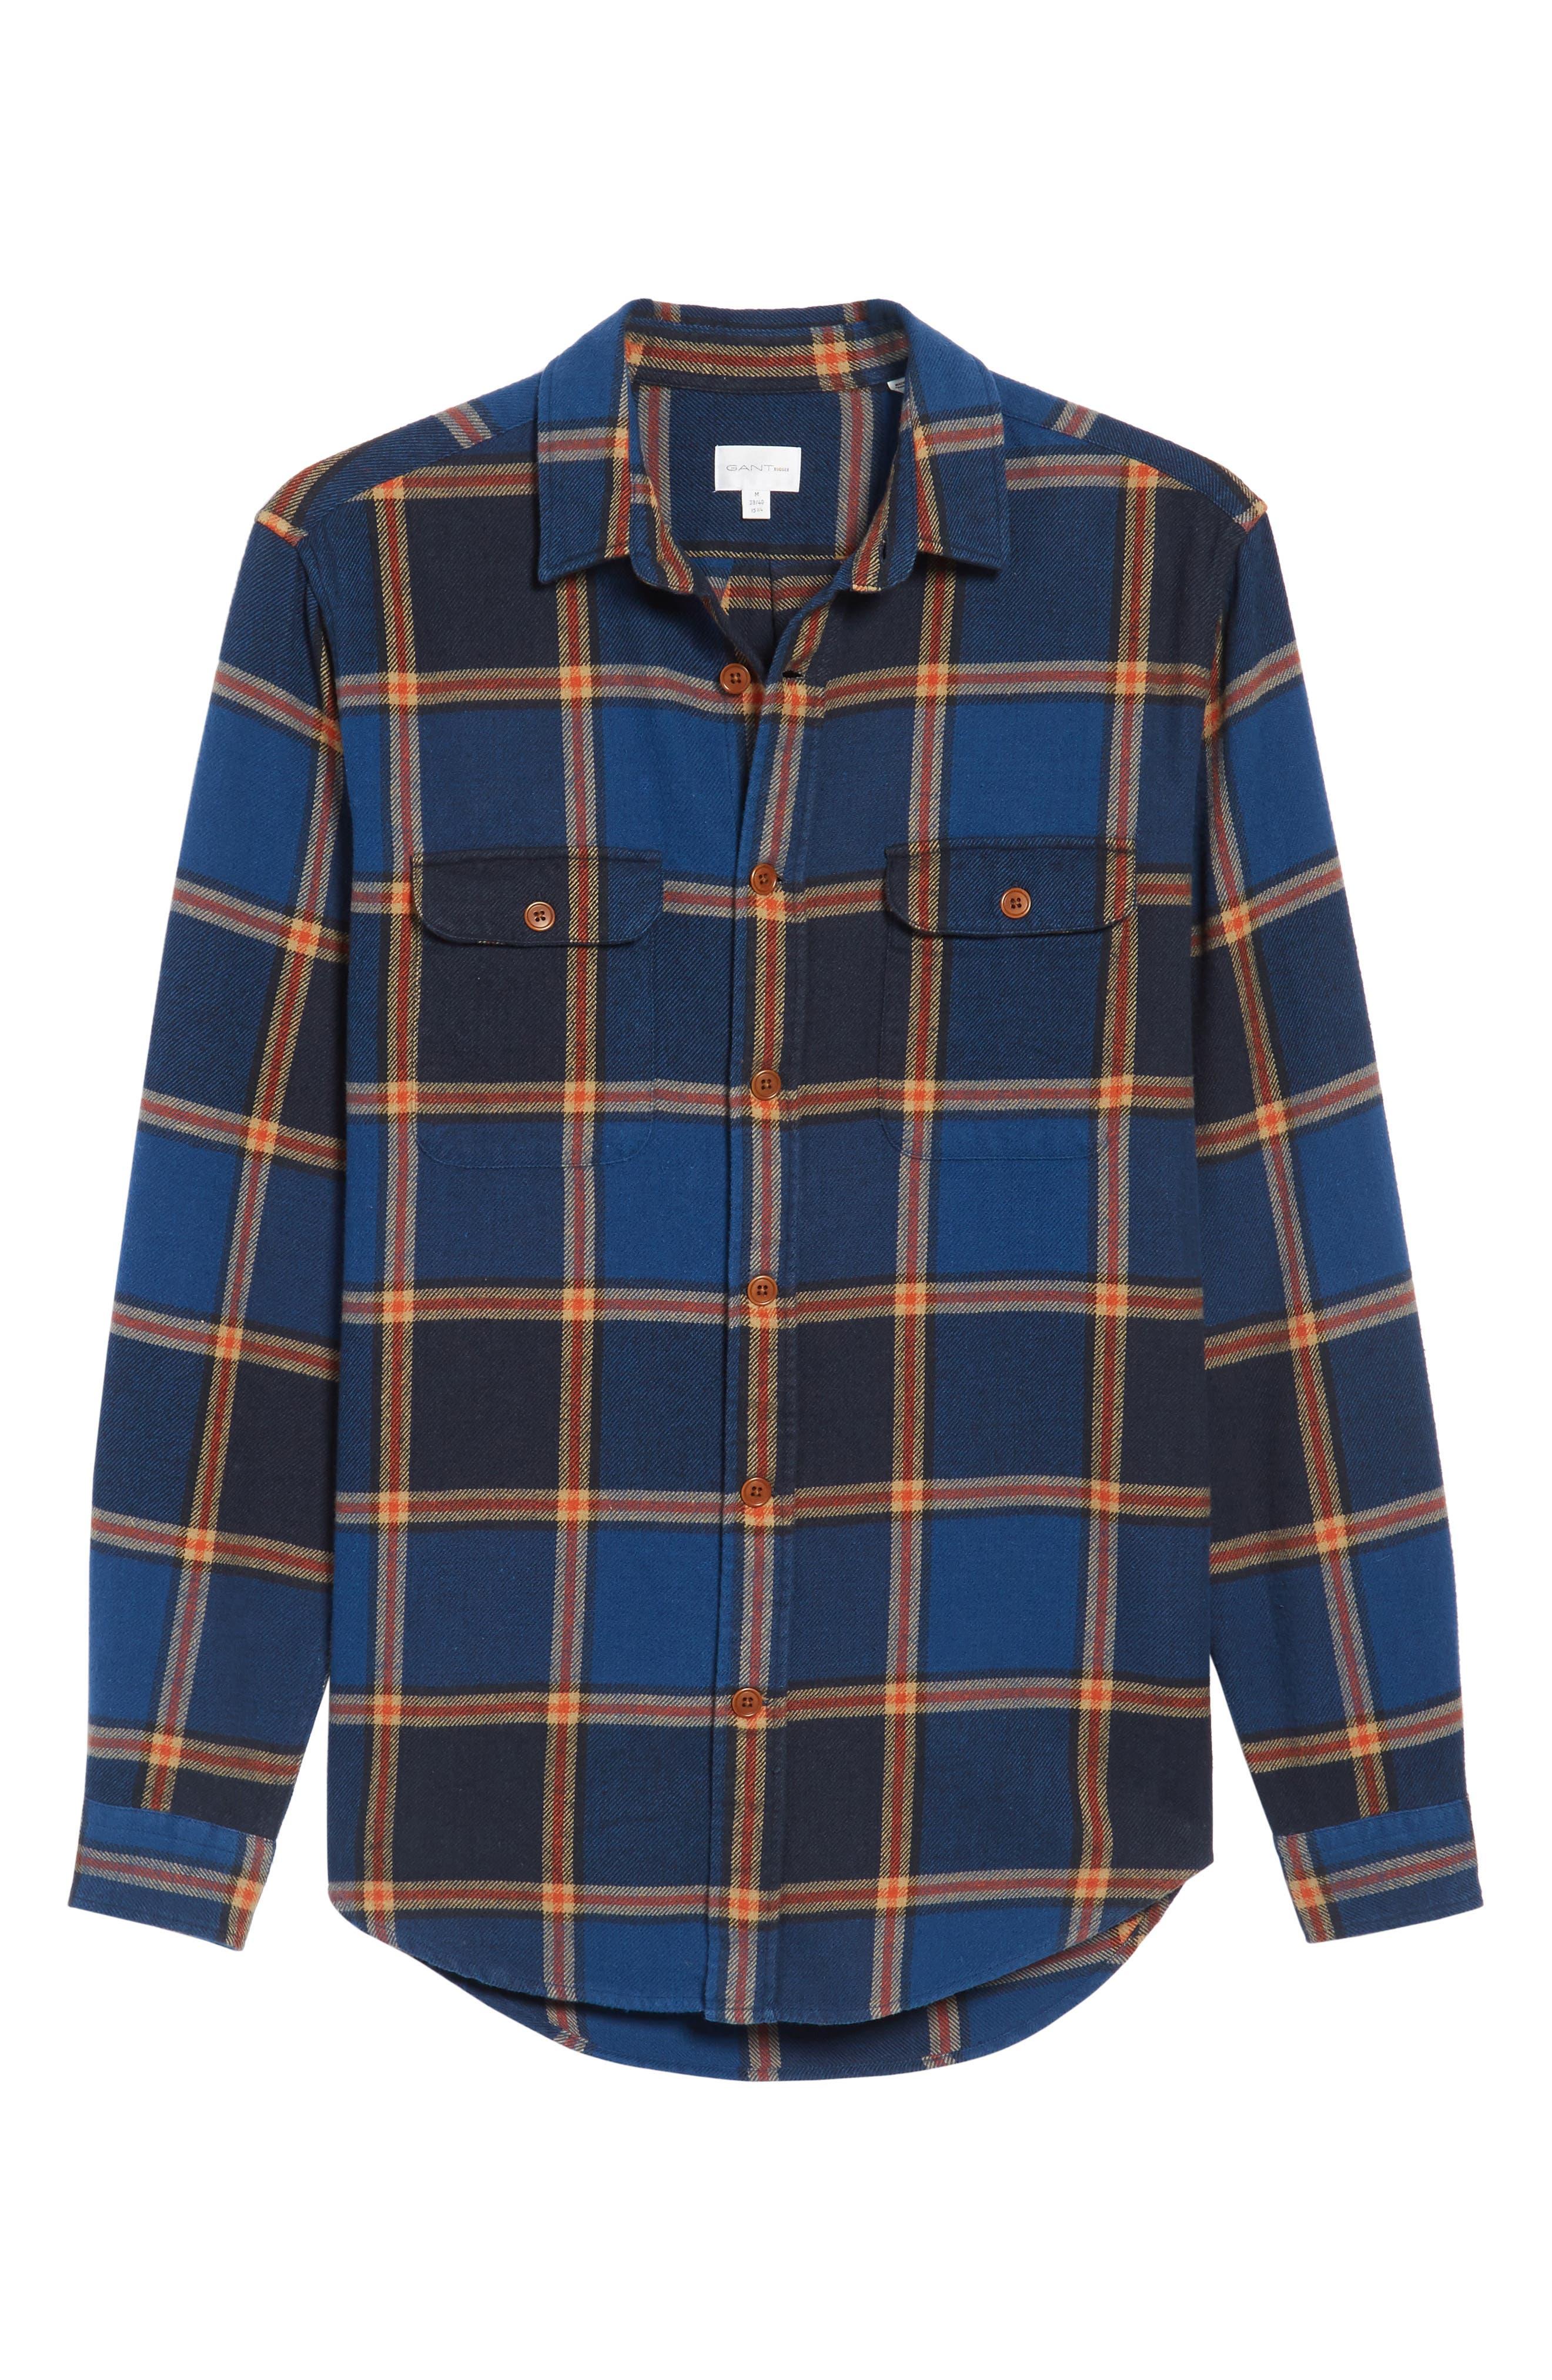 R1 Check Twill Shirt Jacket,                             Alternate thumbnail 6, color,                             410